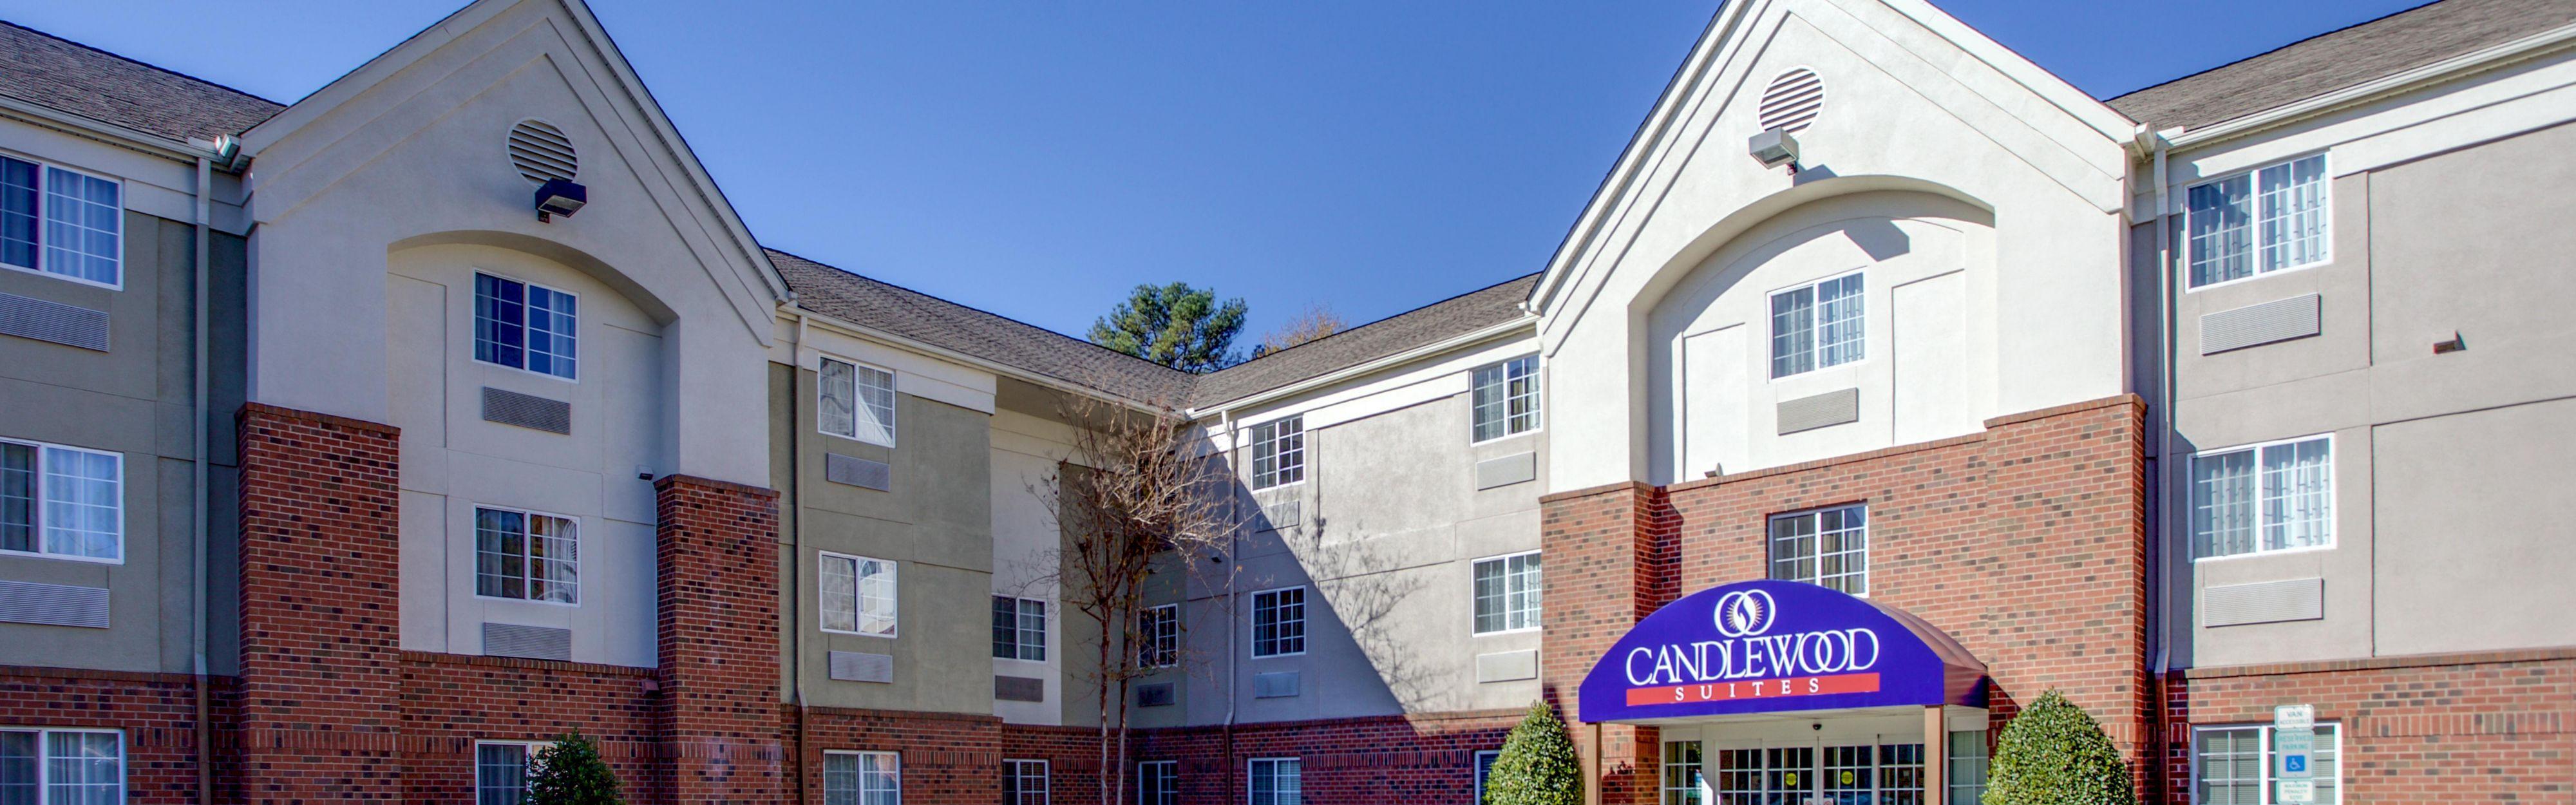 Candlewood Suites Raleigh Crabtree image 0